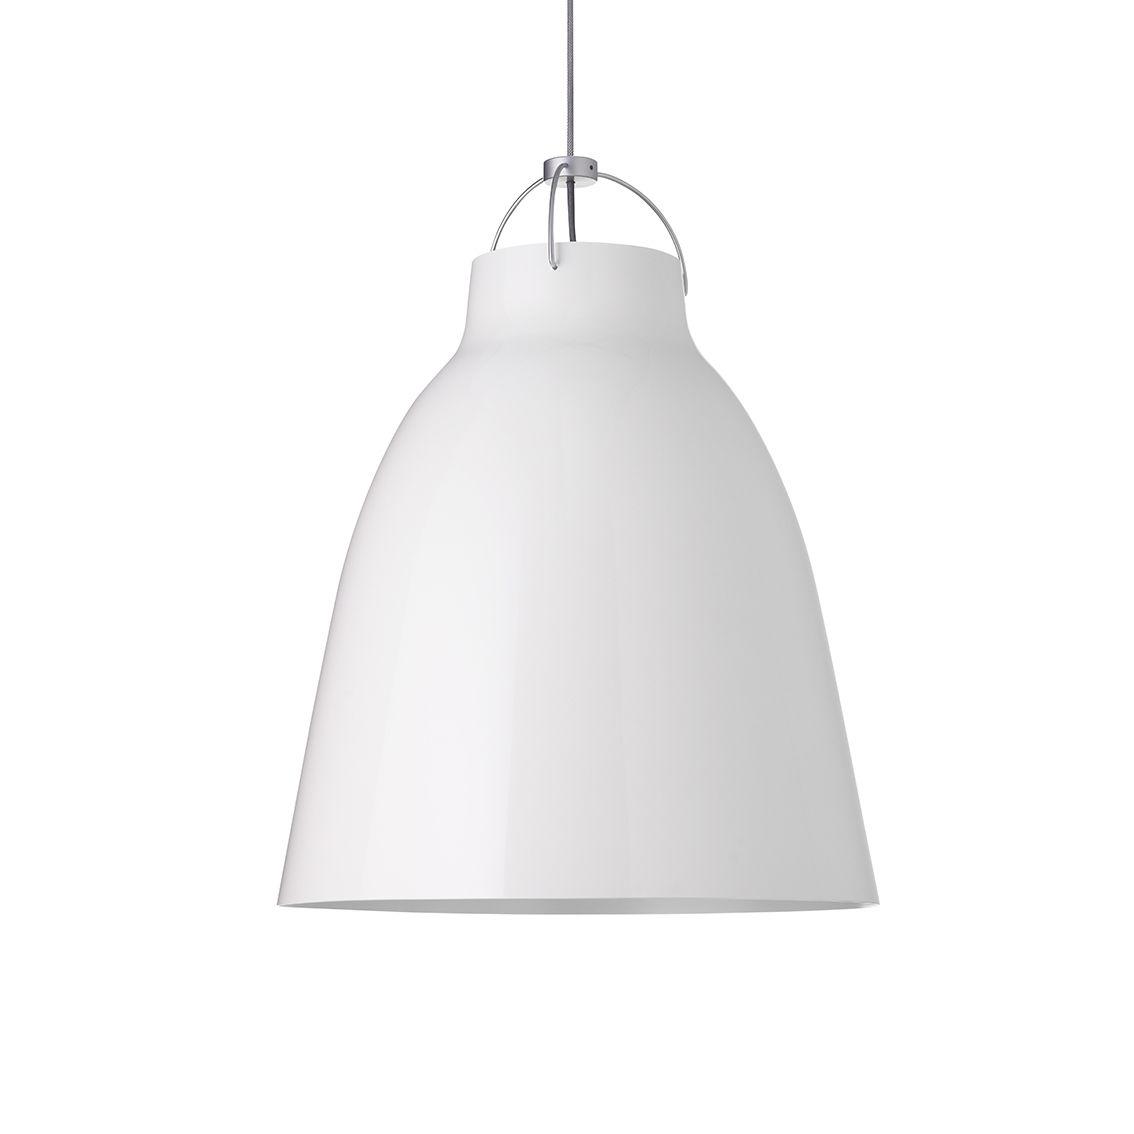 Caravaggio hanglamp Lightyears Ø26 hoogglans wit